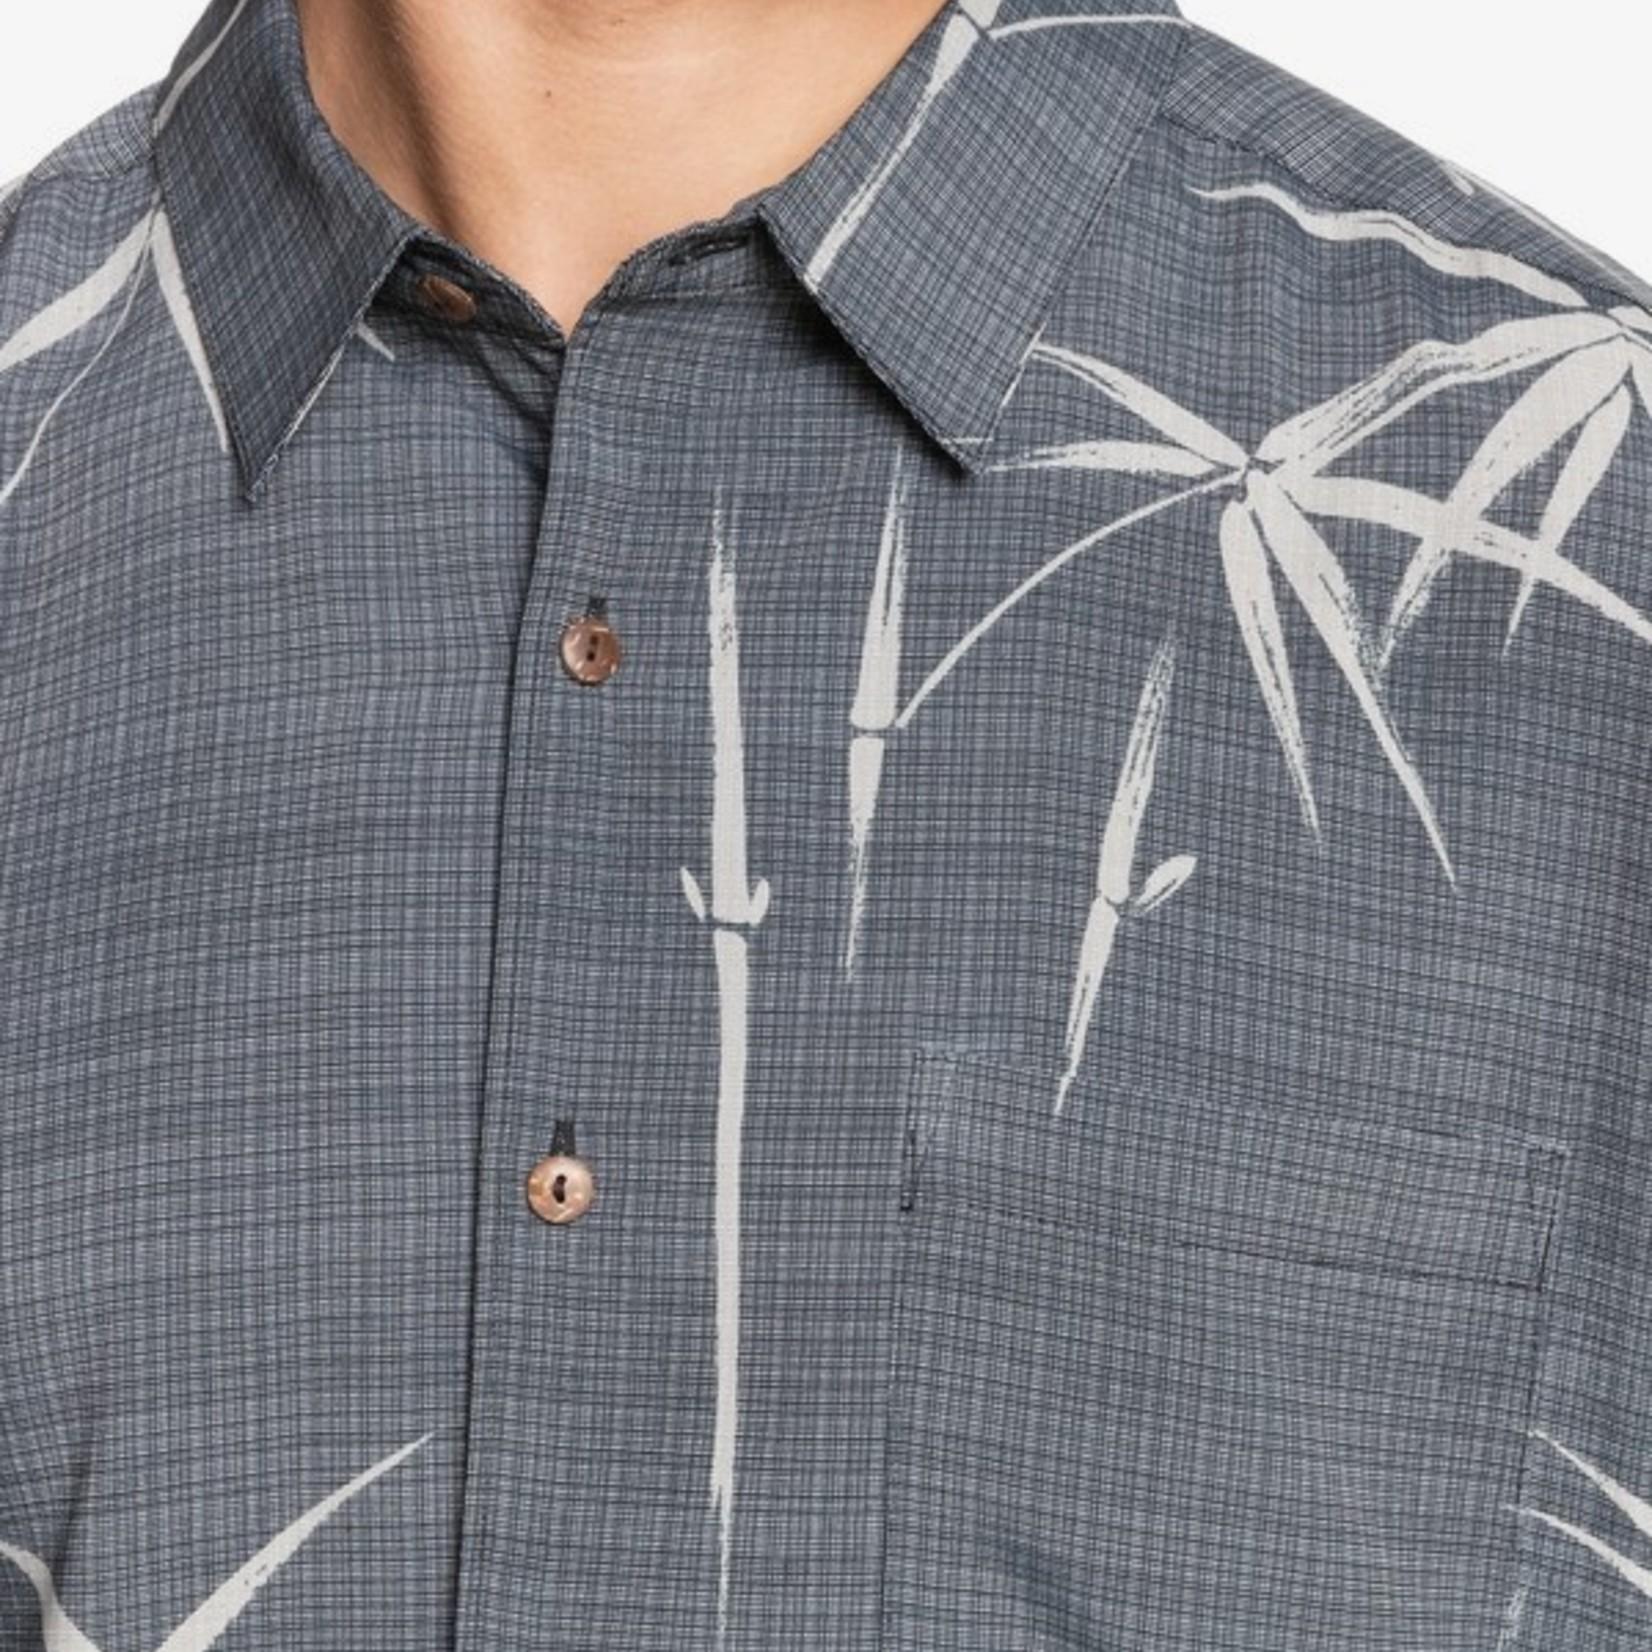 Quiksilver Quiksilver Bamboo Dreams Shirt